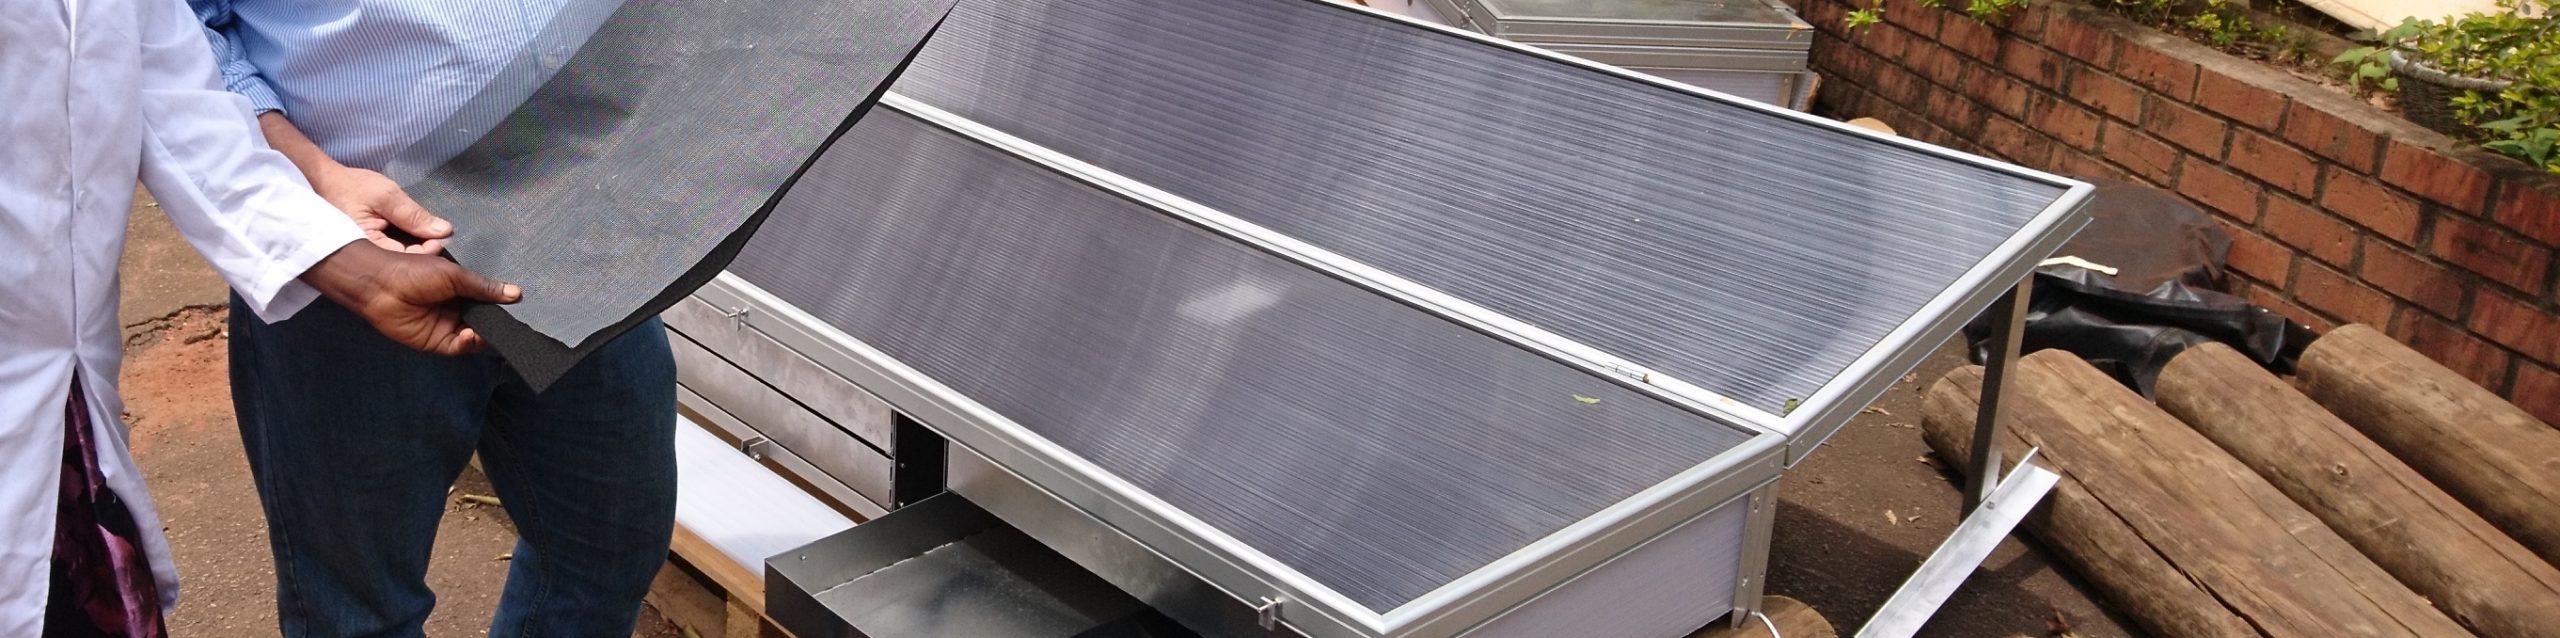 solarventi soltørringsanlæg